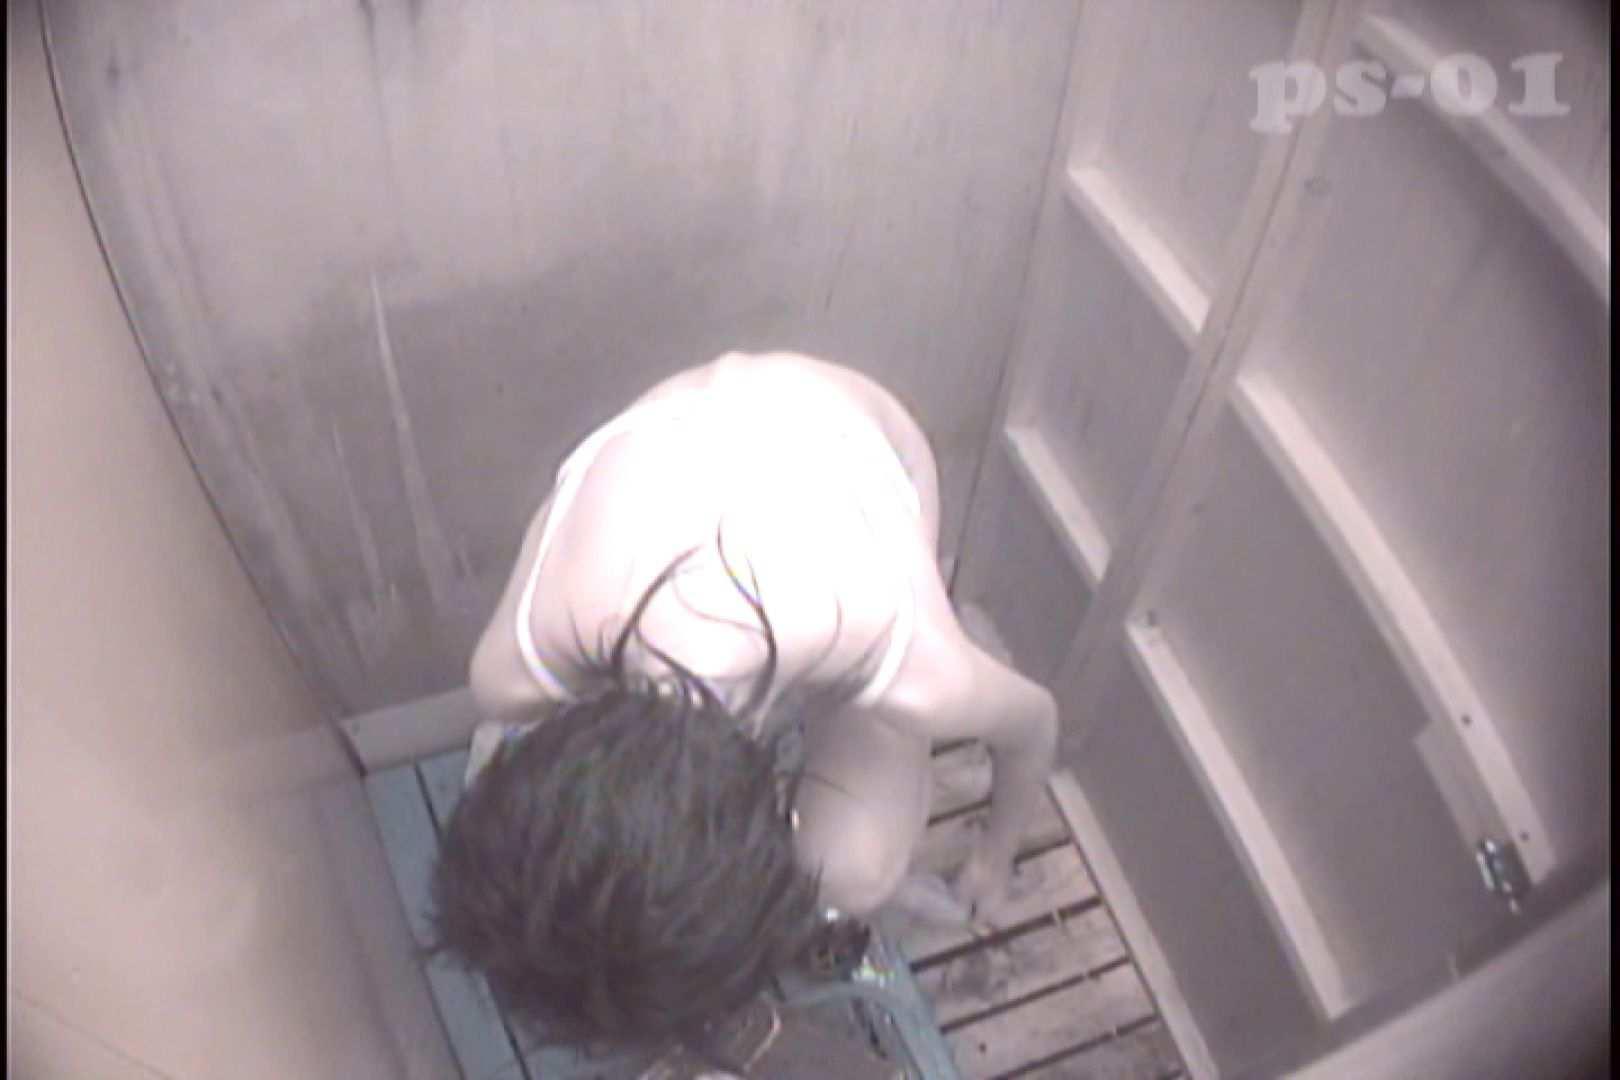 File.02 貧乳と下着がナイス! シャワー エロ画像 69画像 29